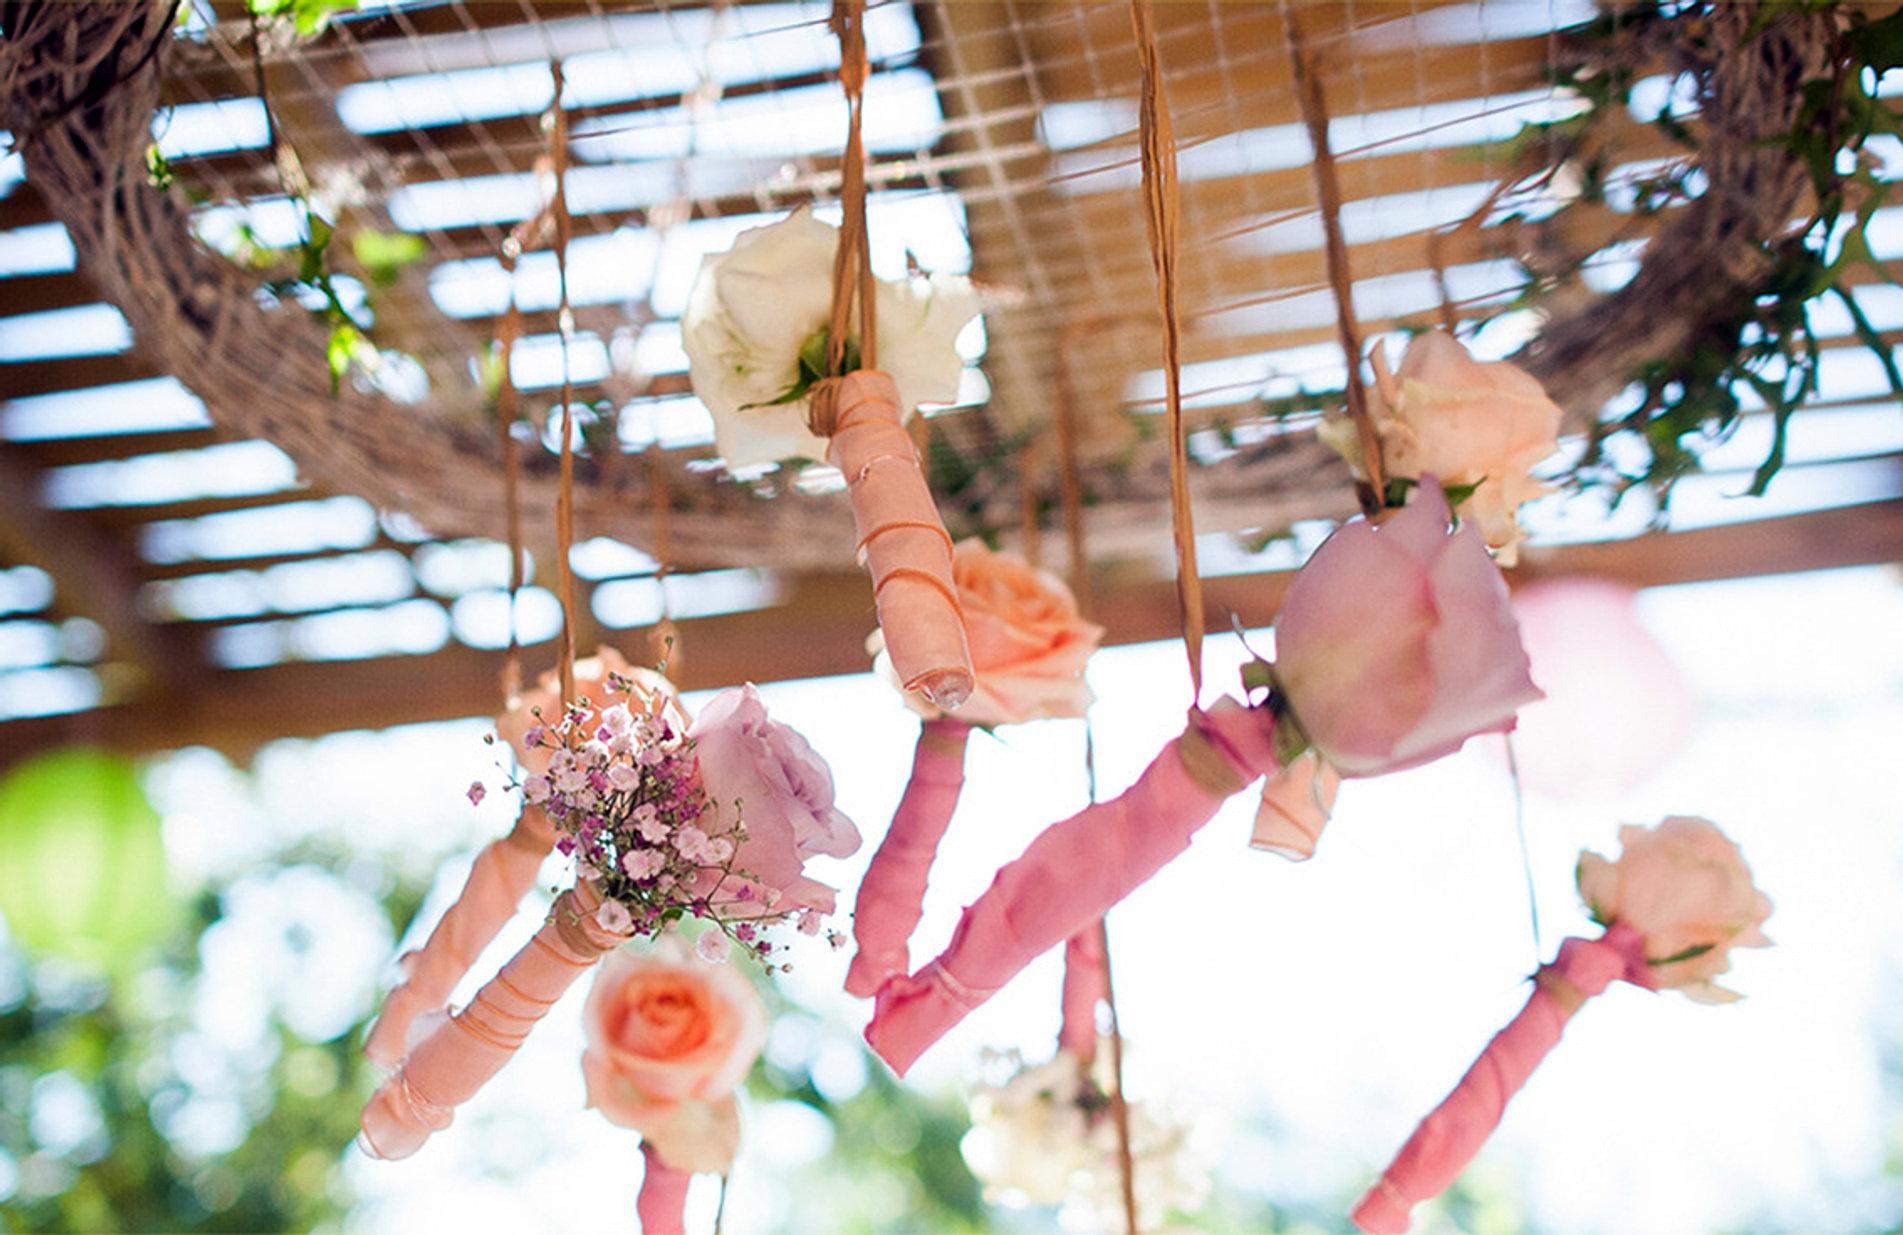 so 39 liane cr ation d coratrice florale sp cialiste du mariage. Black Bedroom Furniture Sets. Home Design Ideas